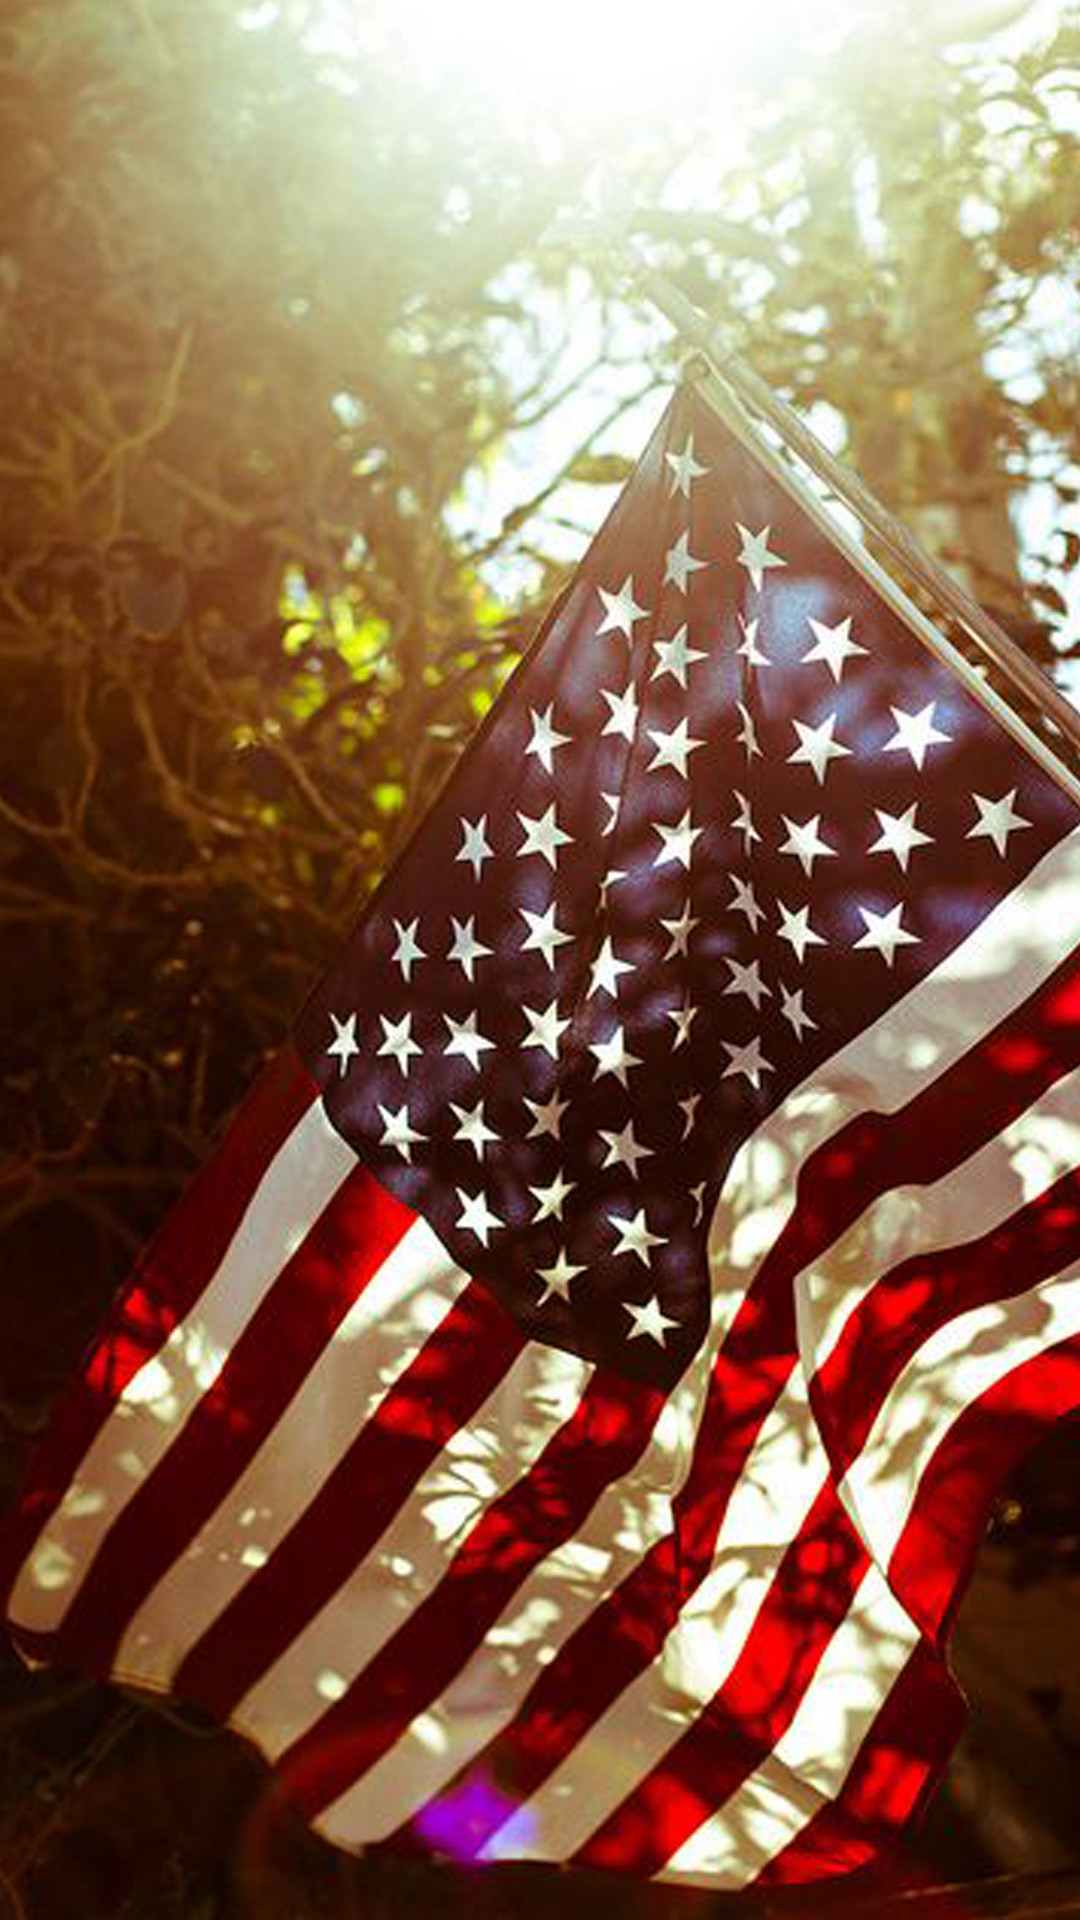 <b>american flag iphone wallpaper</b> download free <b>